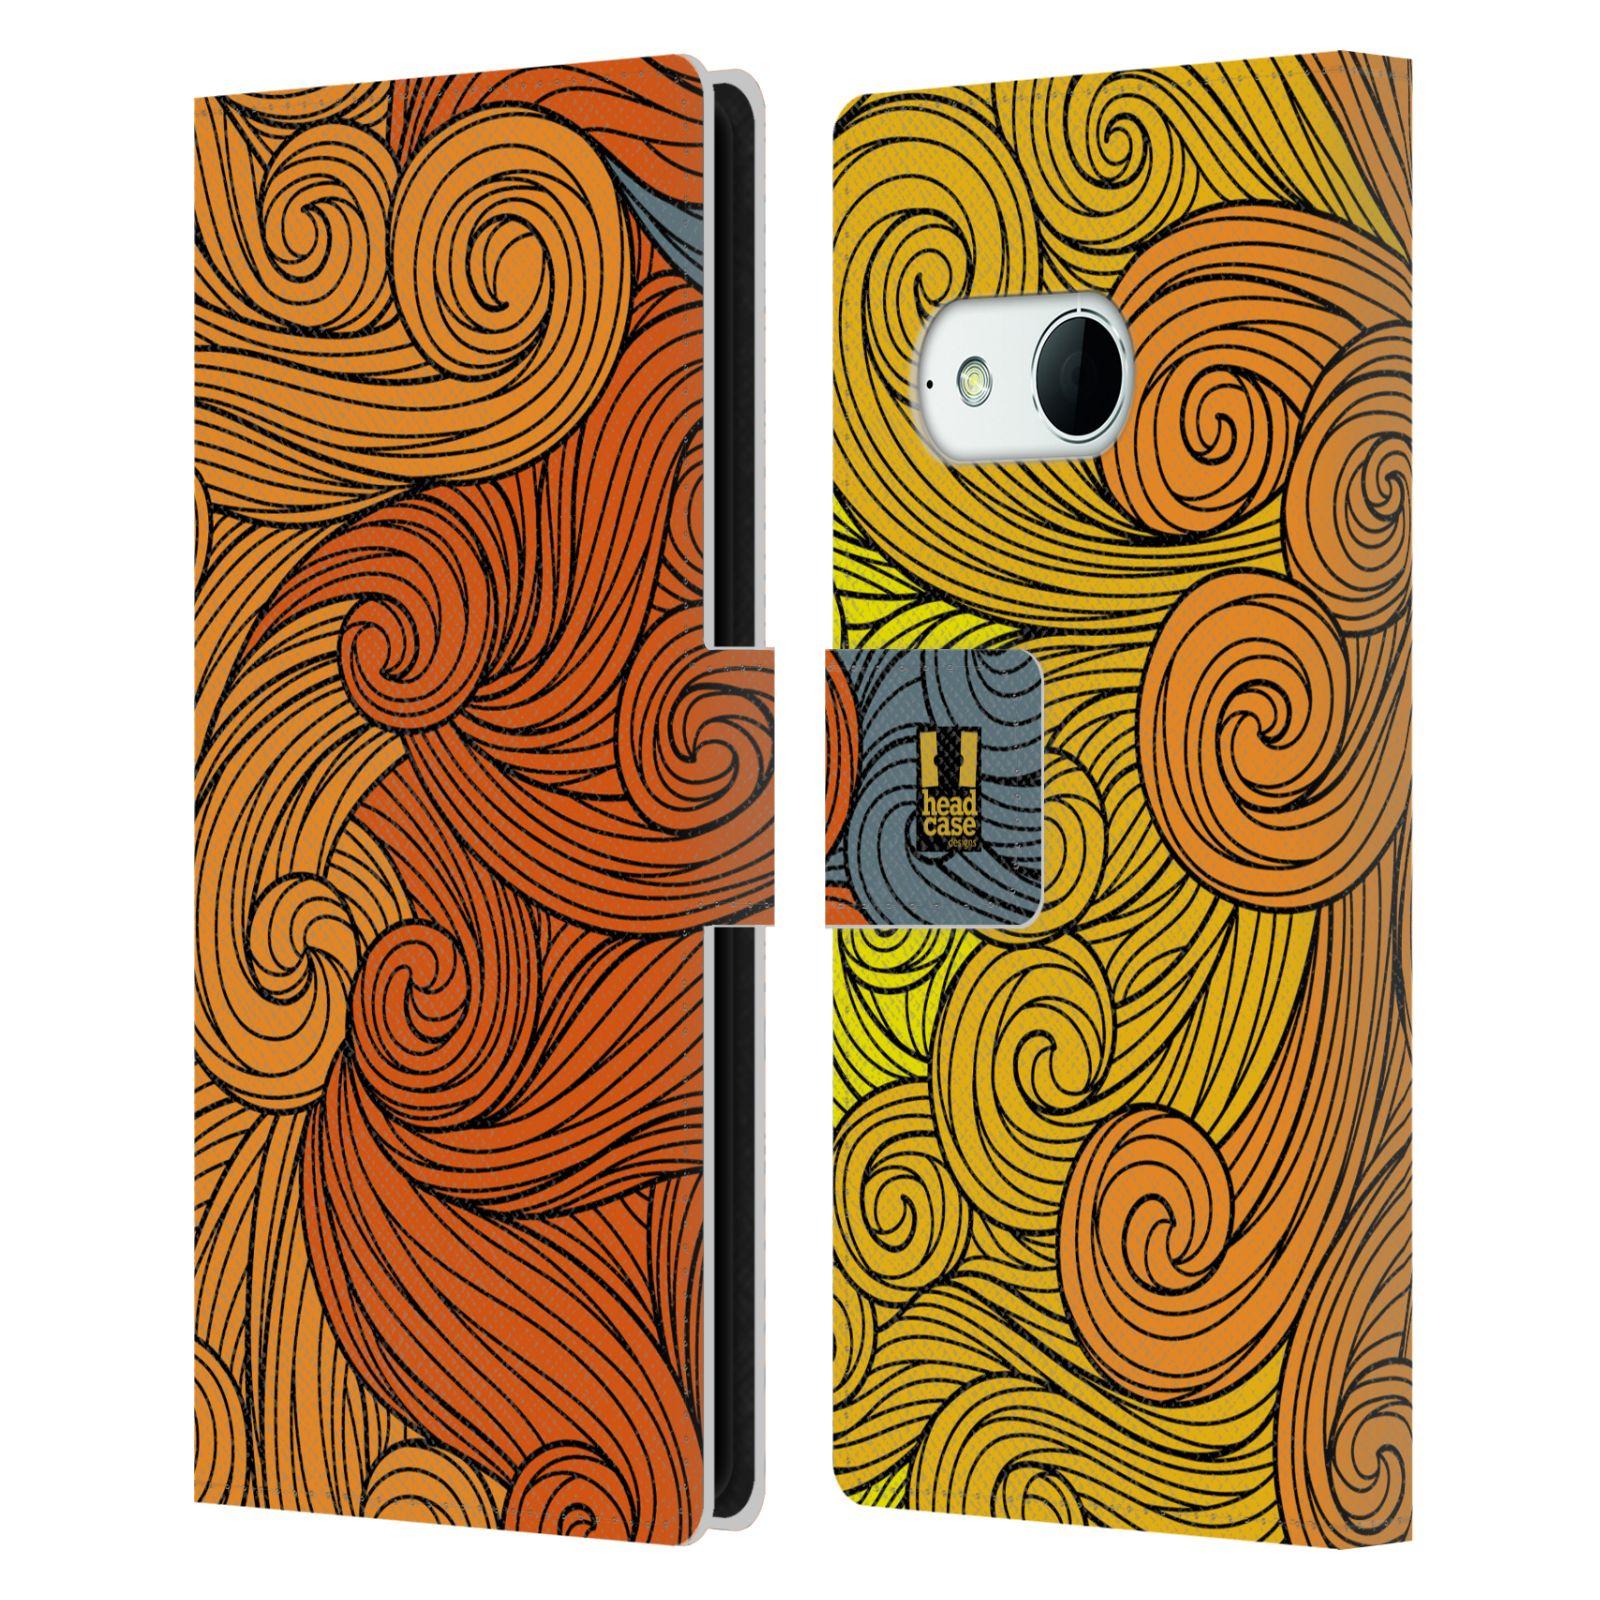 HEAD CASE Flipové pouzdro pro mobil HTC ONE MINI 2 (M8) barevné vlny žlutá a oranžová